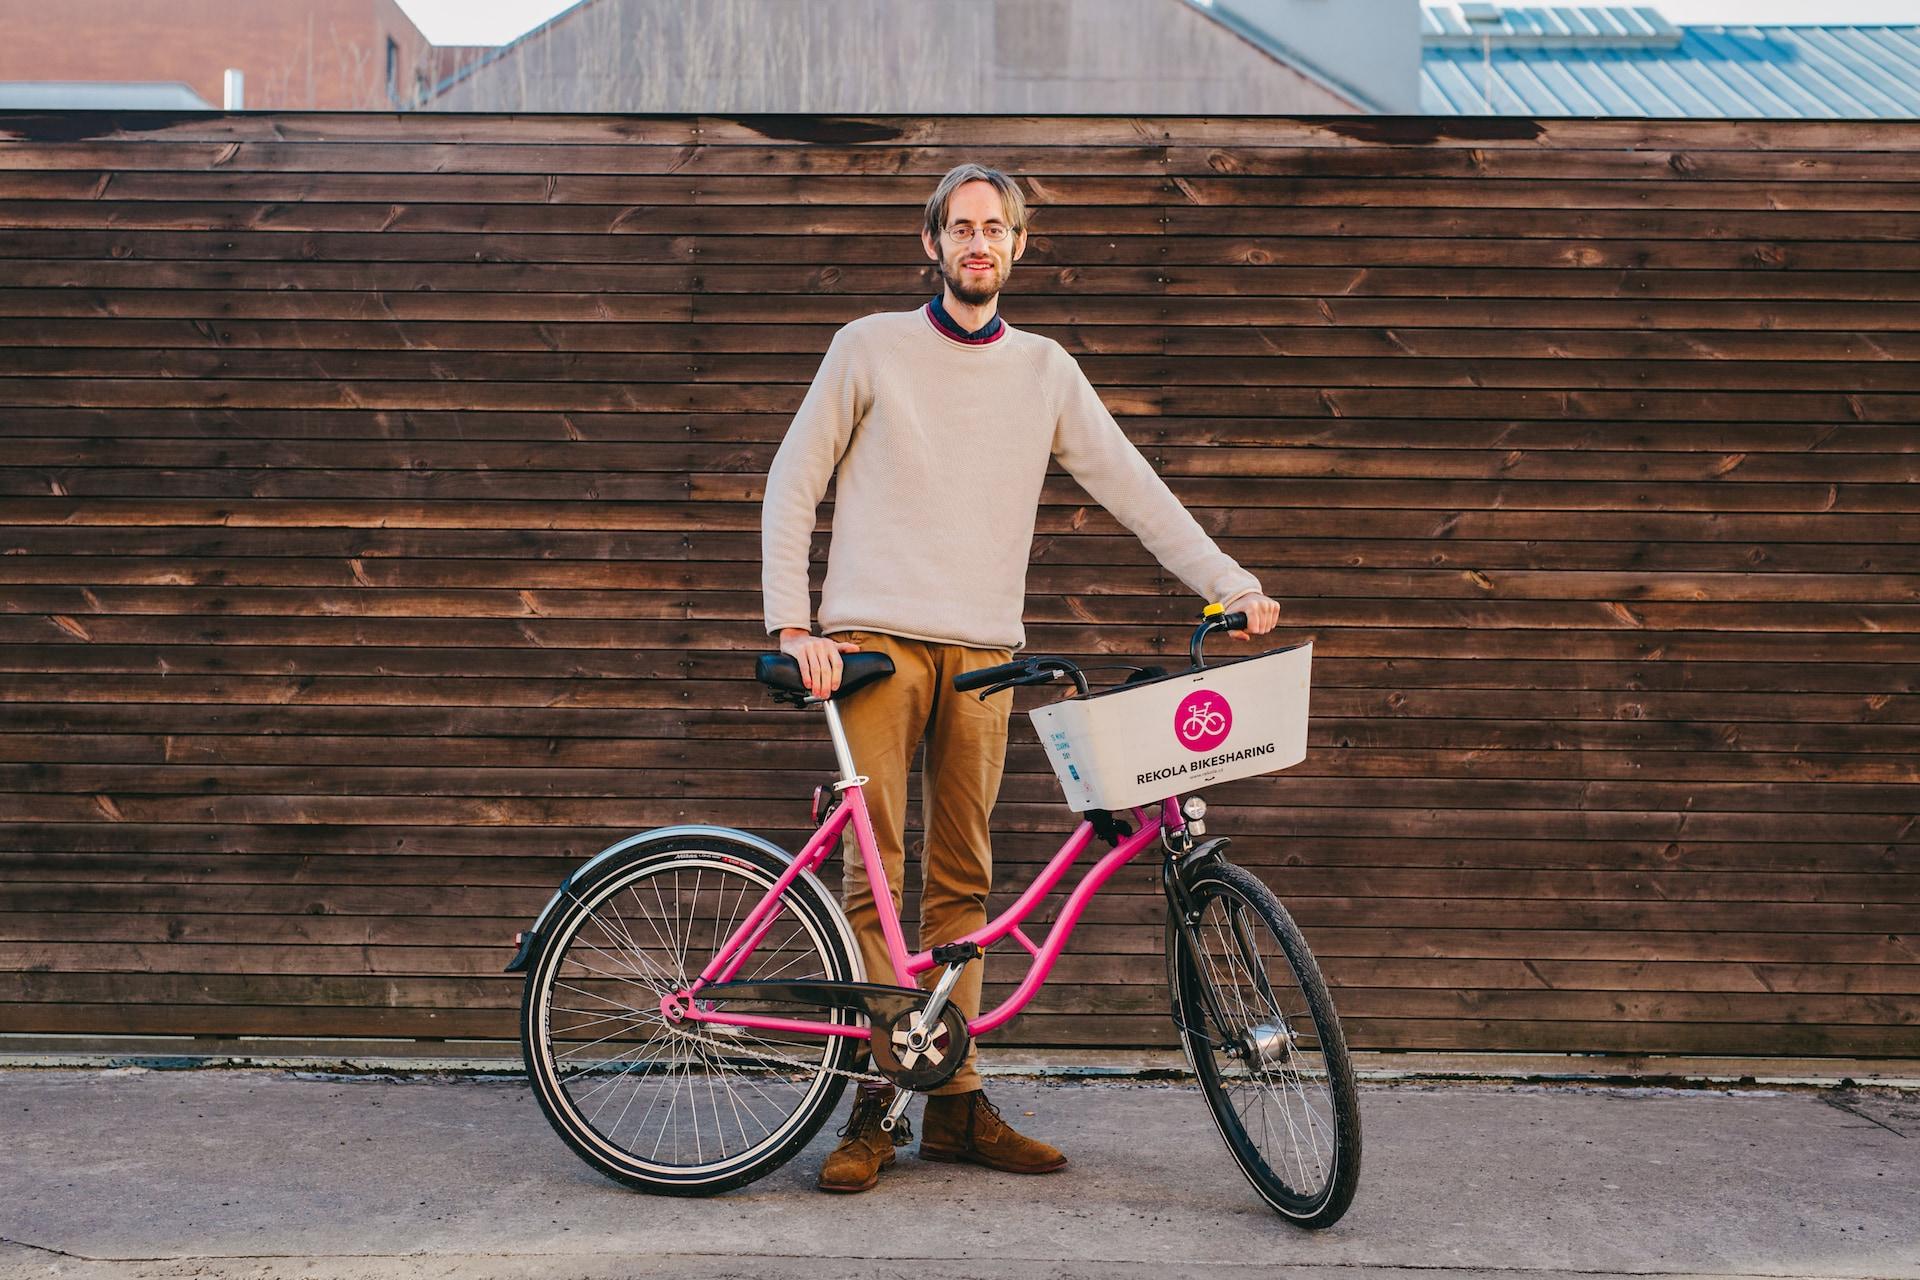 Vítek Ježek, zakladatel a ředitel firmy Rekola Bikesharing